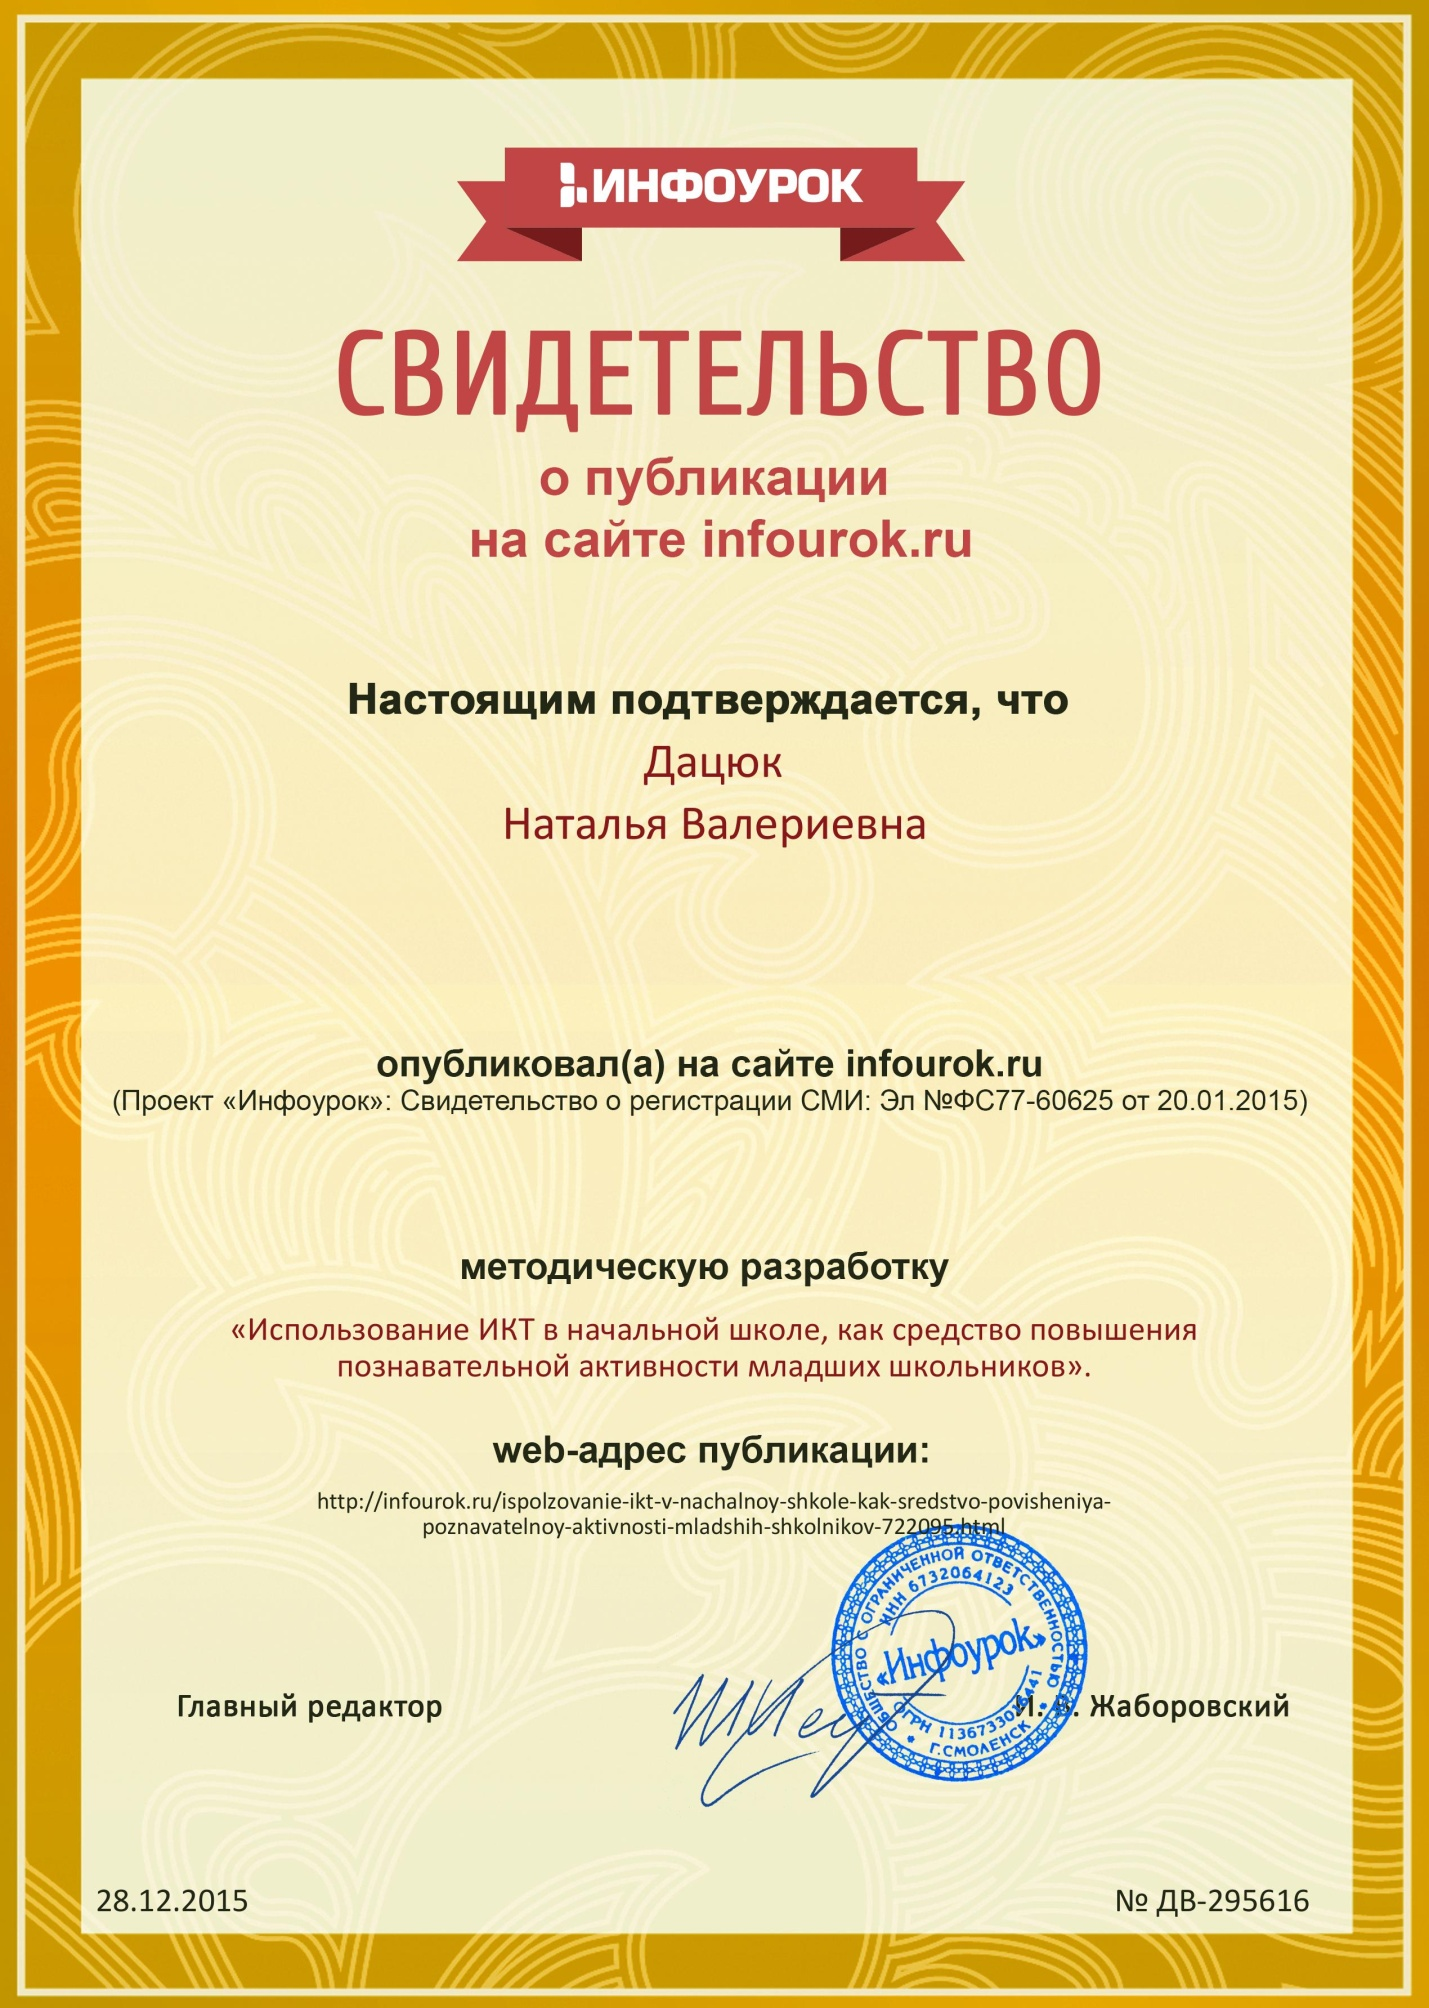 Сертификат проекта infourok.ru № ДВ-295616.jpg